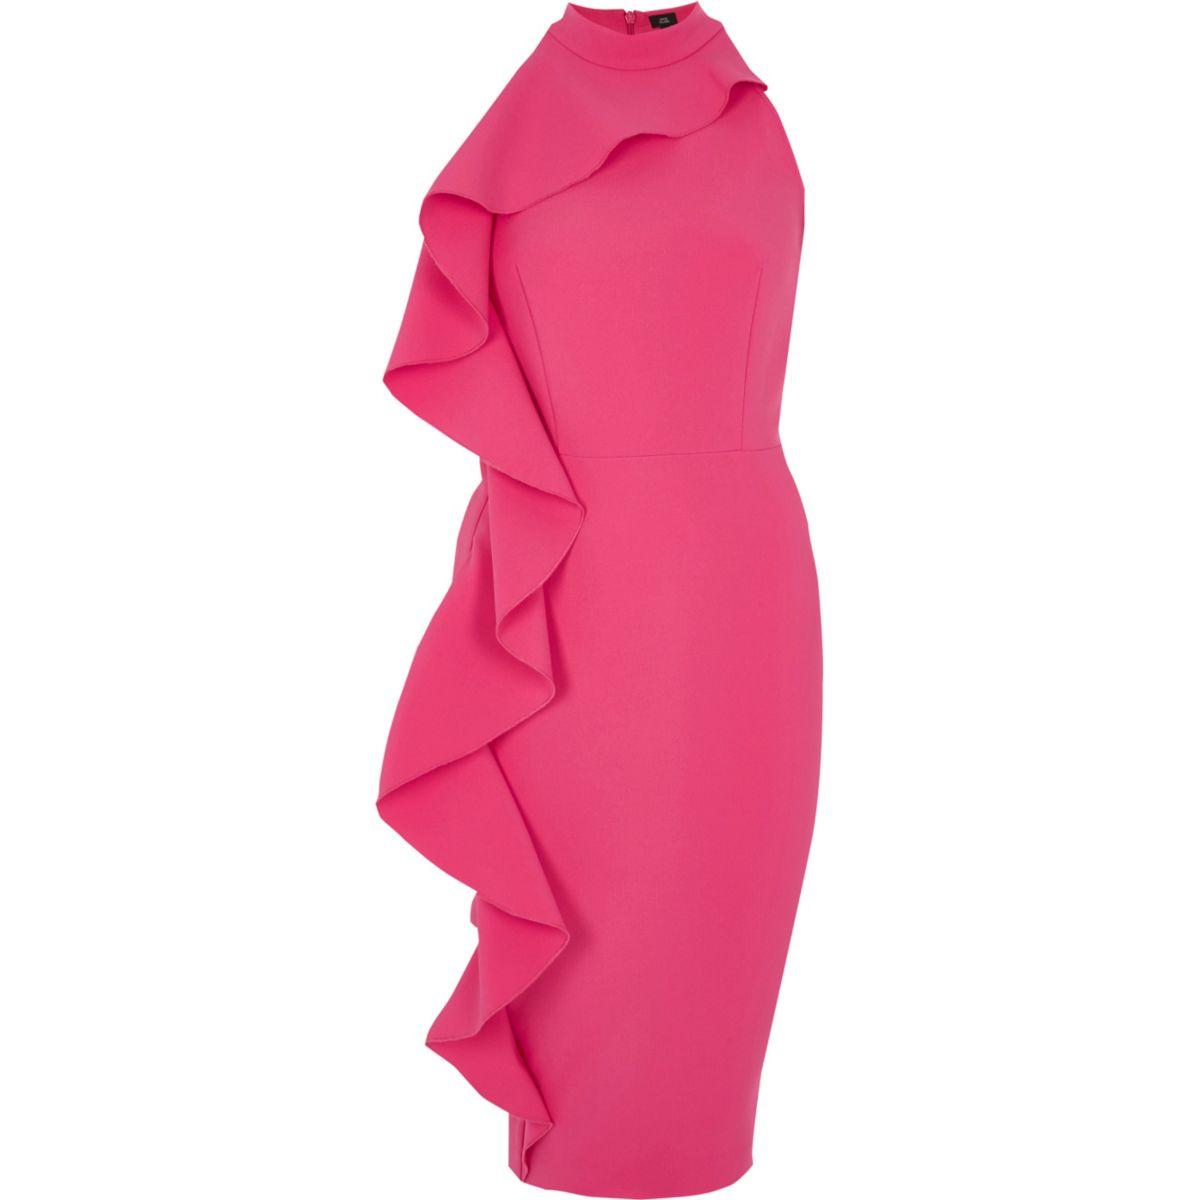 Pink frill side sleeveless bodycon dress